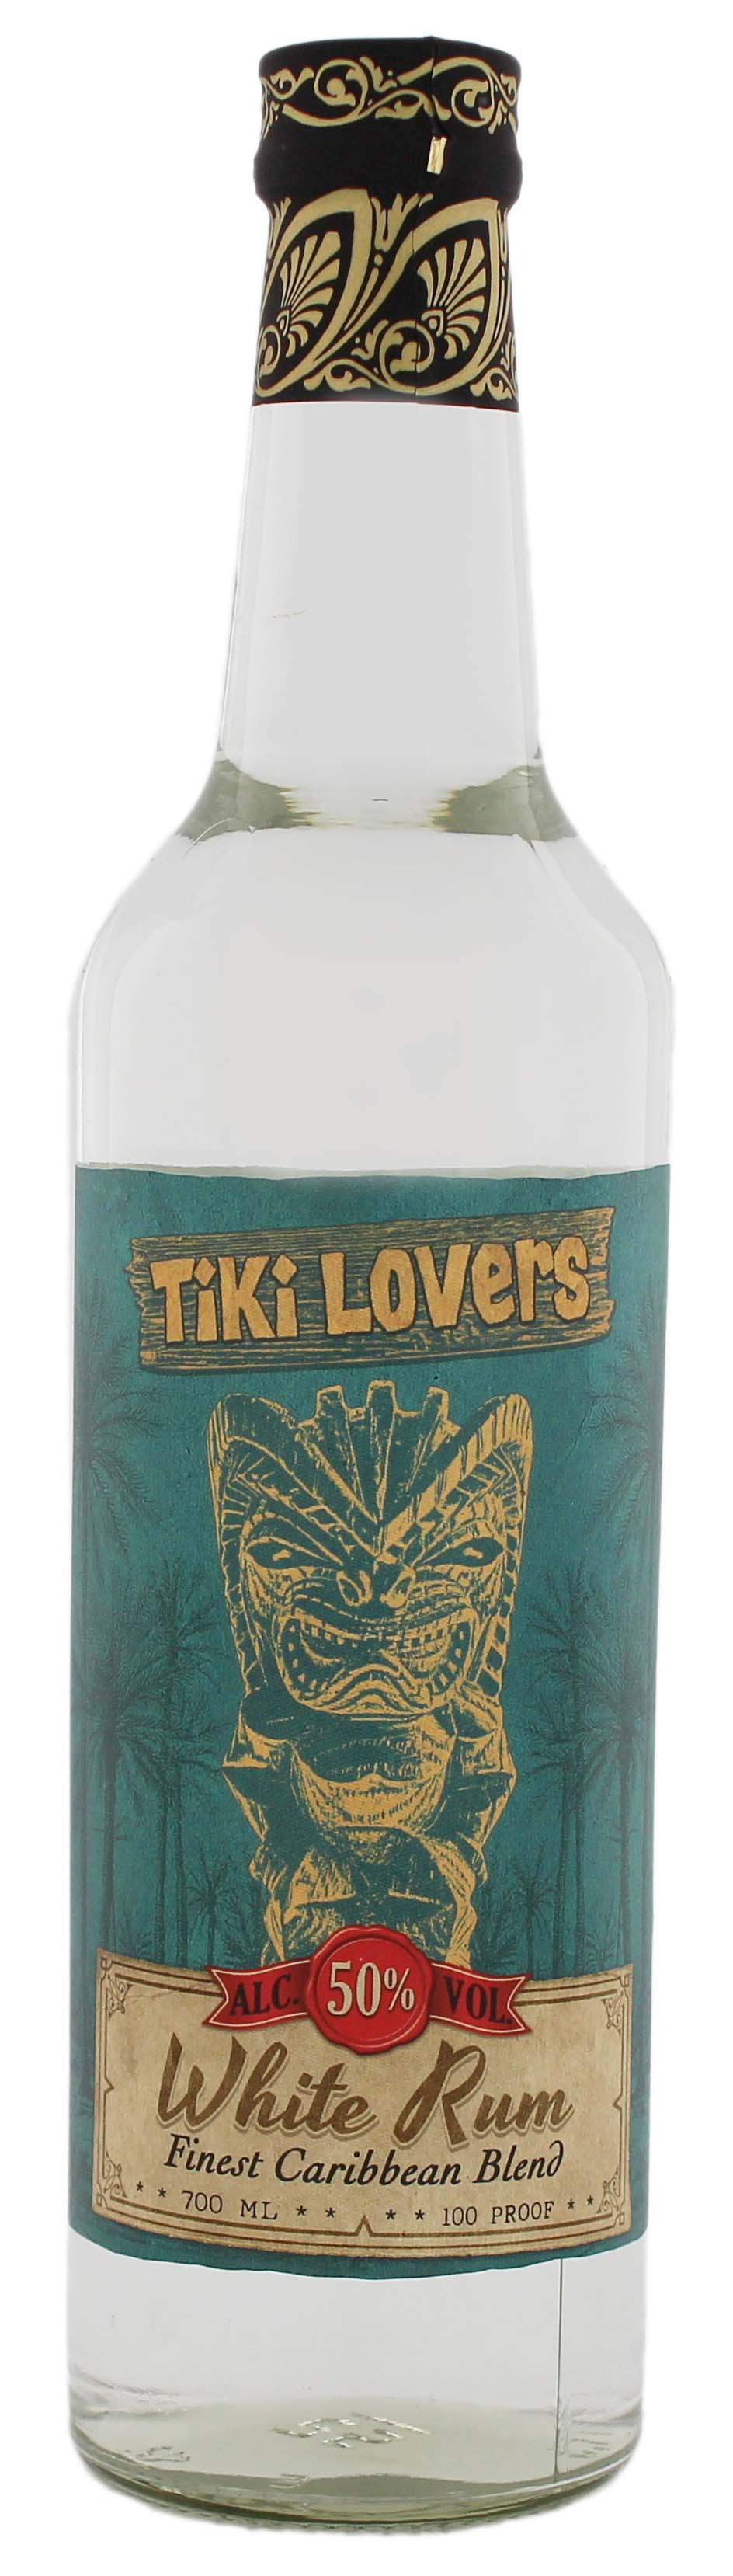 Tiki Lovers White Rum 0,7L